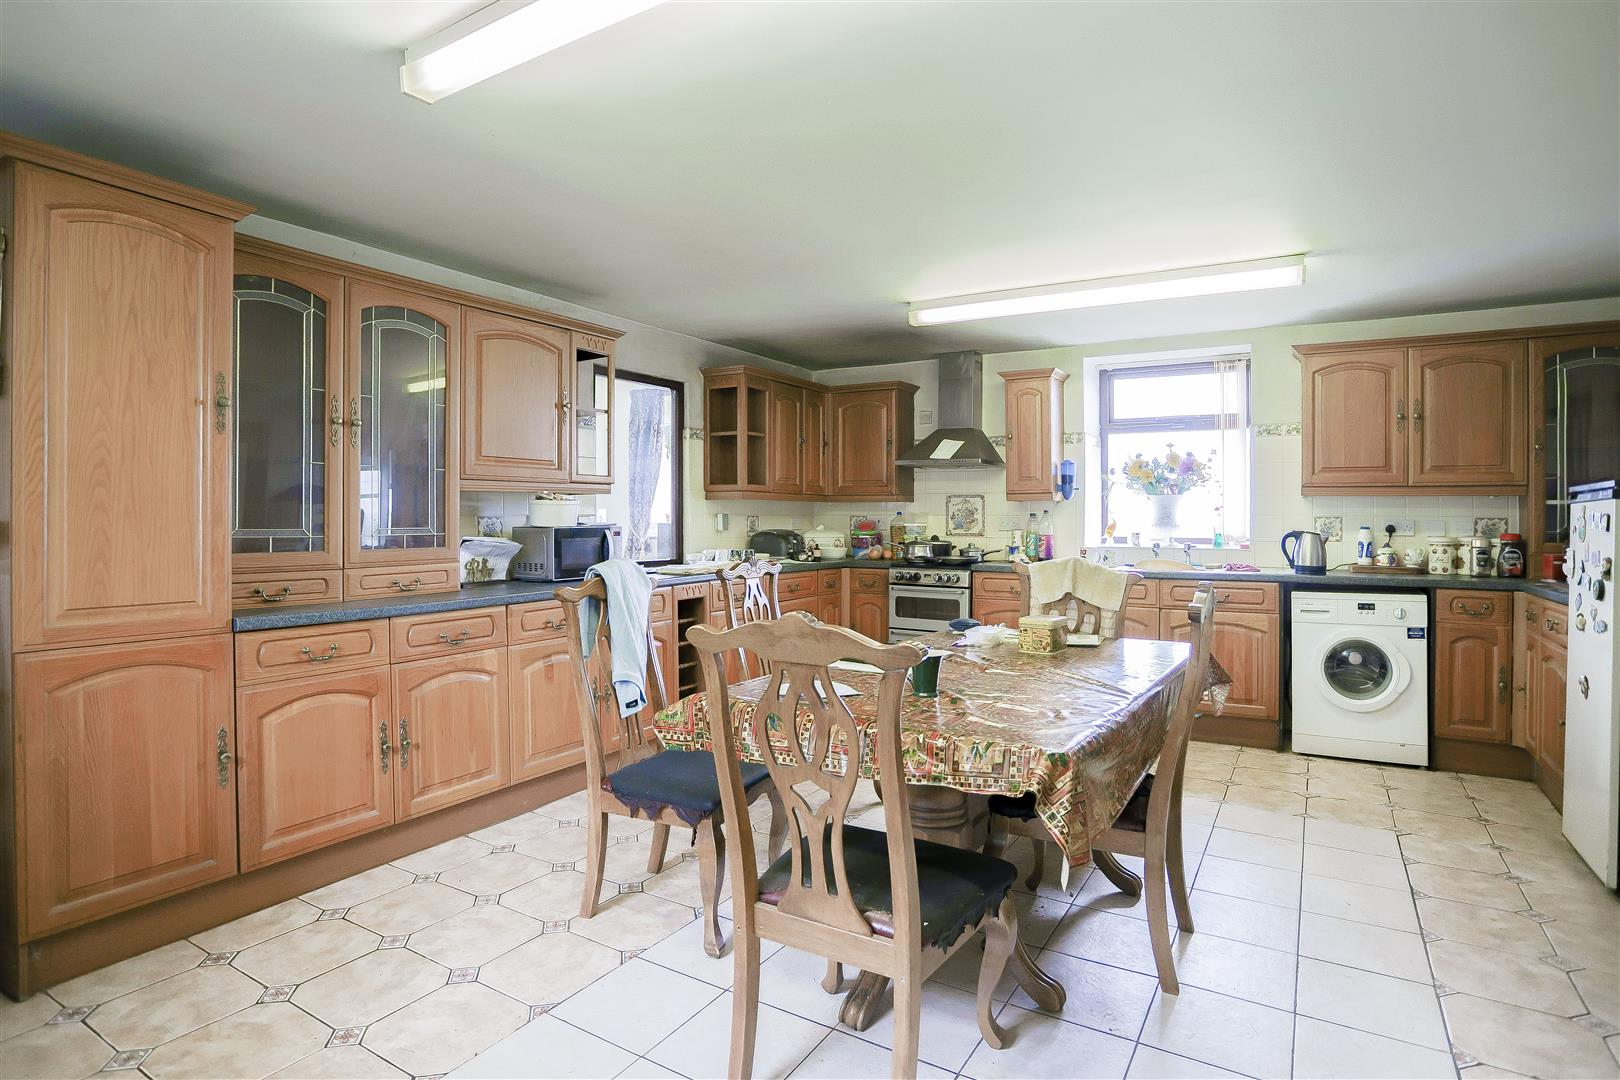 2 Bedroom Barn Conversion For Sale - IMG_2402.jpg